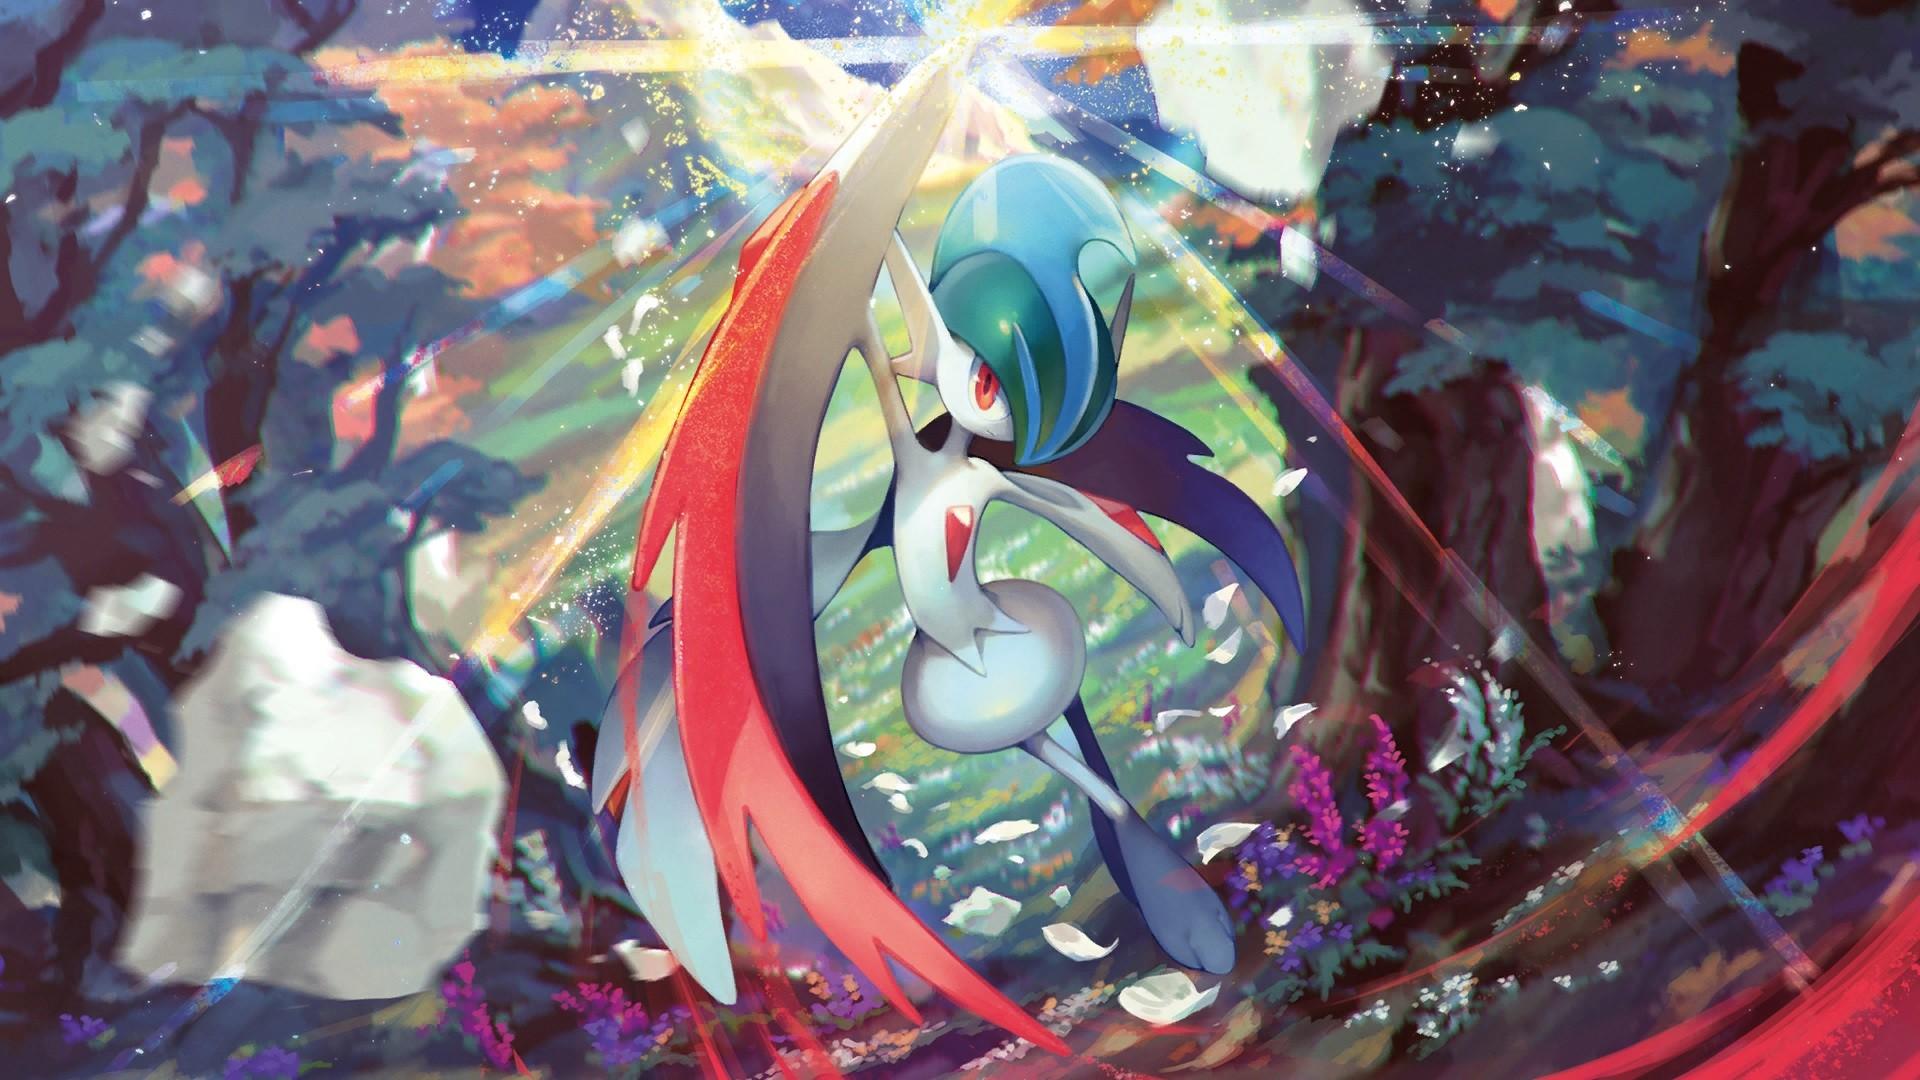 Image РMega Gallade Pokemon TCG XY Roaring Skies.jpg | Pok̩mon Wiki |  FANDOM powered by Wikia